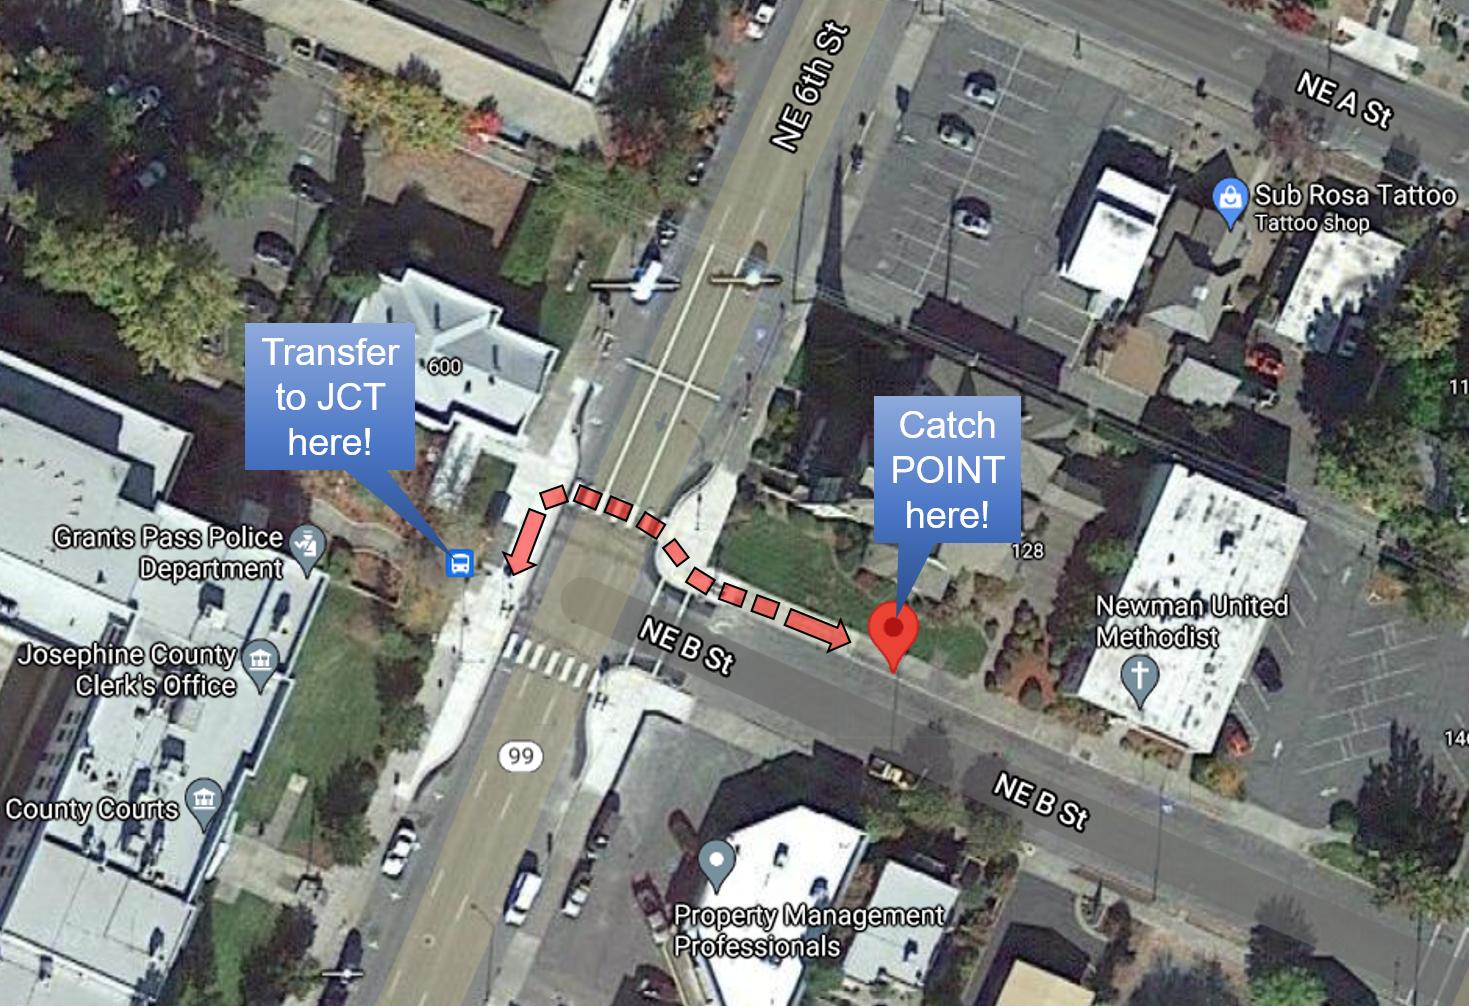 Grants Pass transfer location